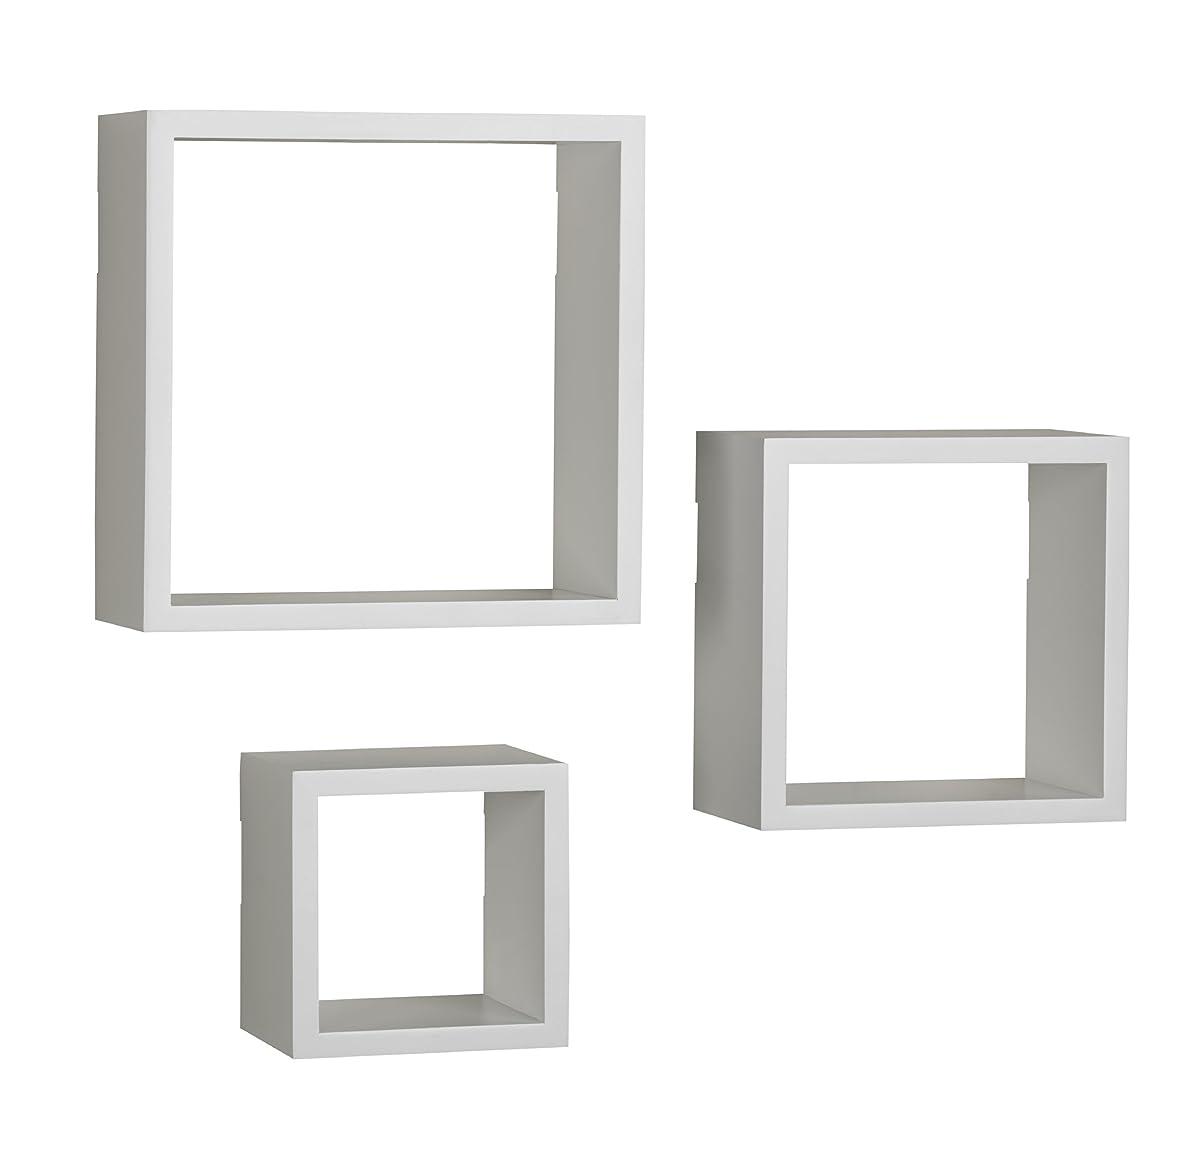 MELANNCO Floating Wall Mount Square Cube Shelves, Set of 3, White